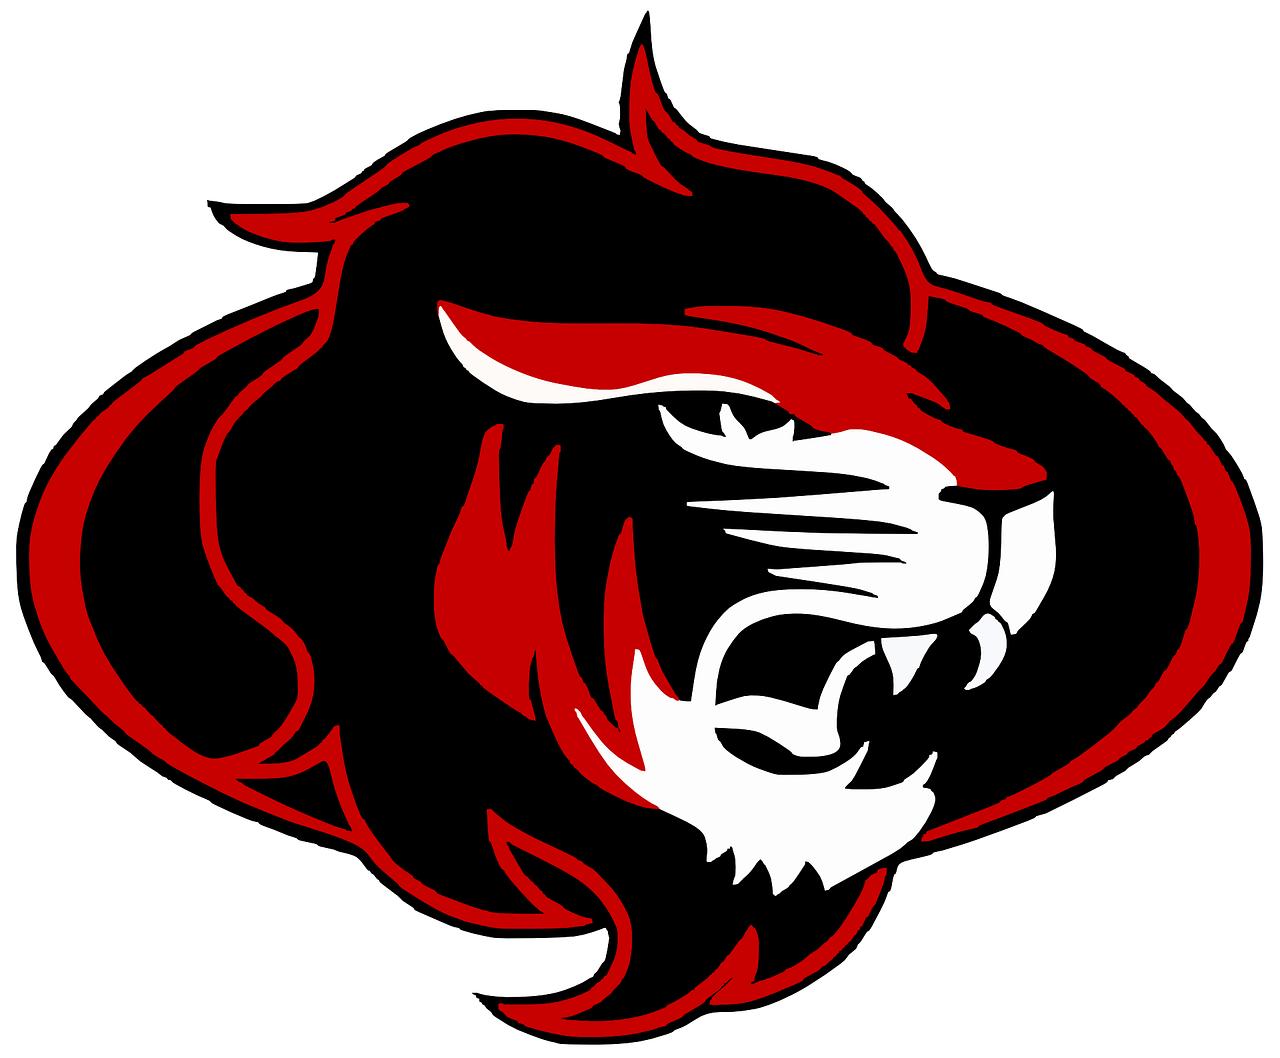 team-red-logo